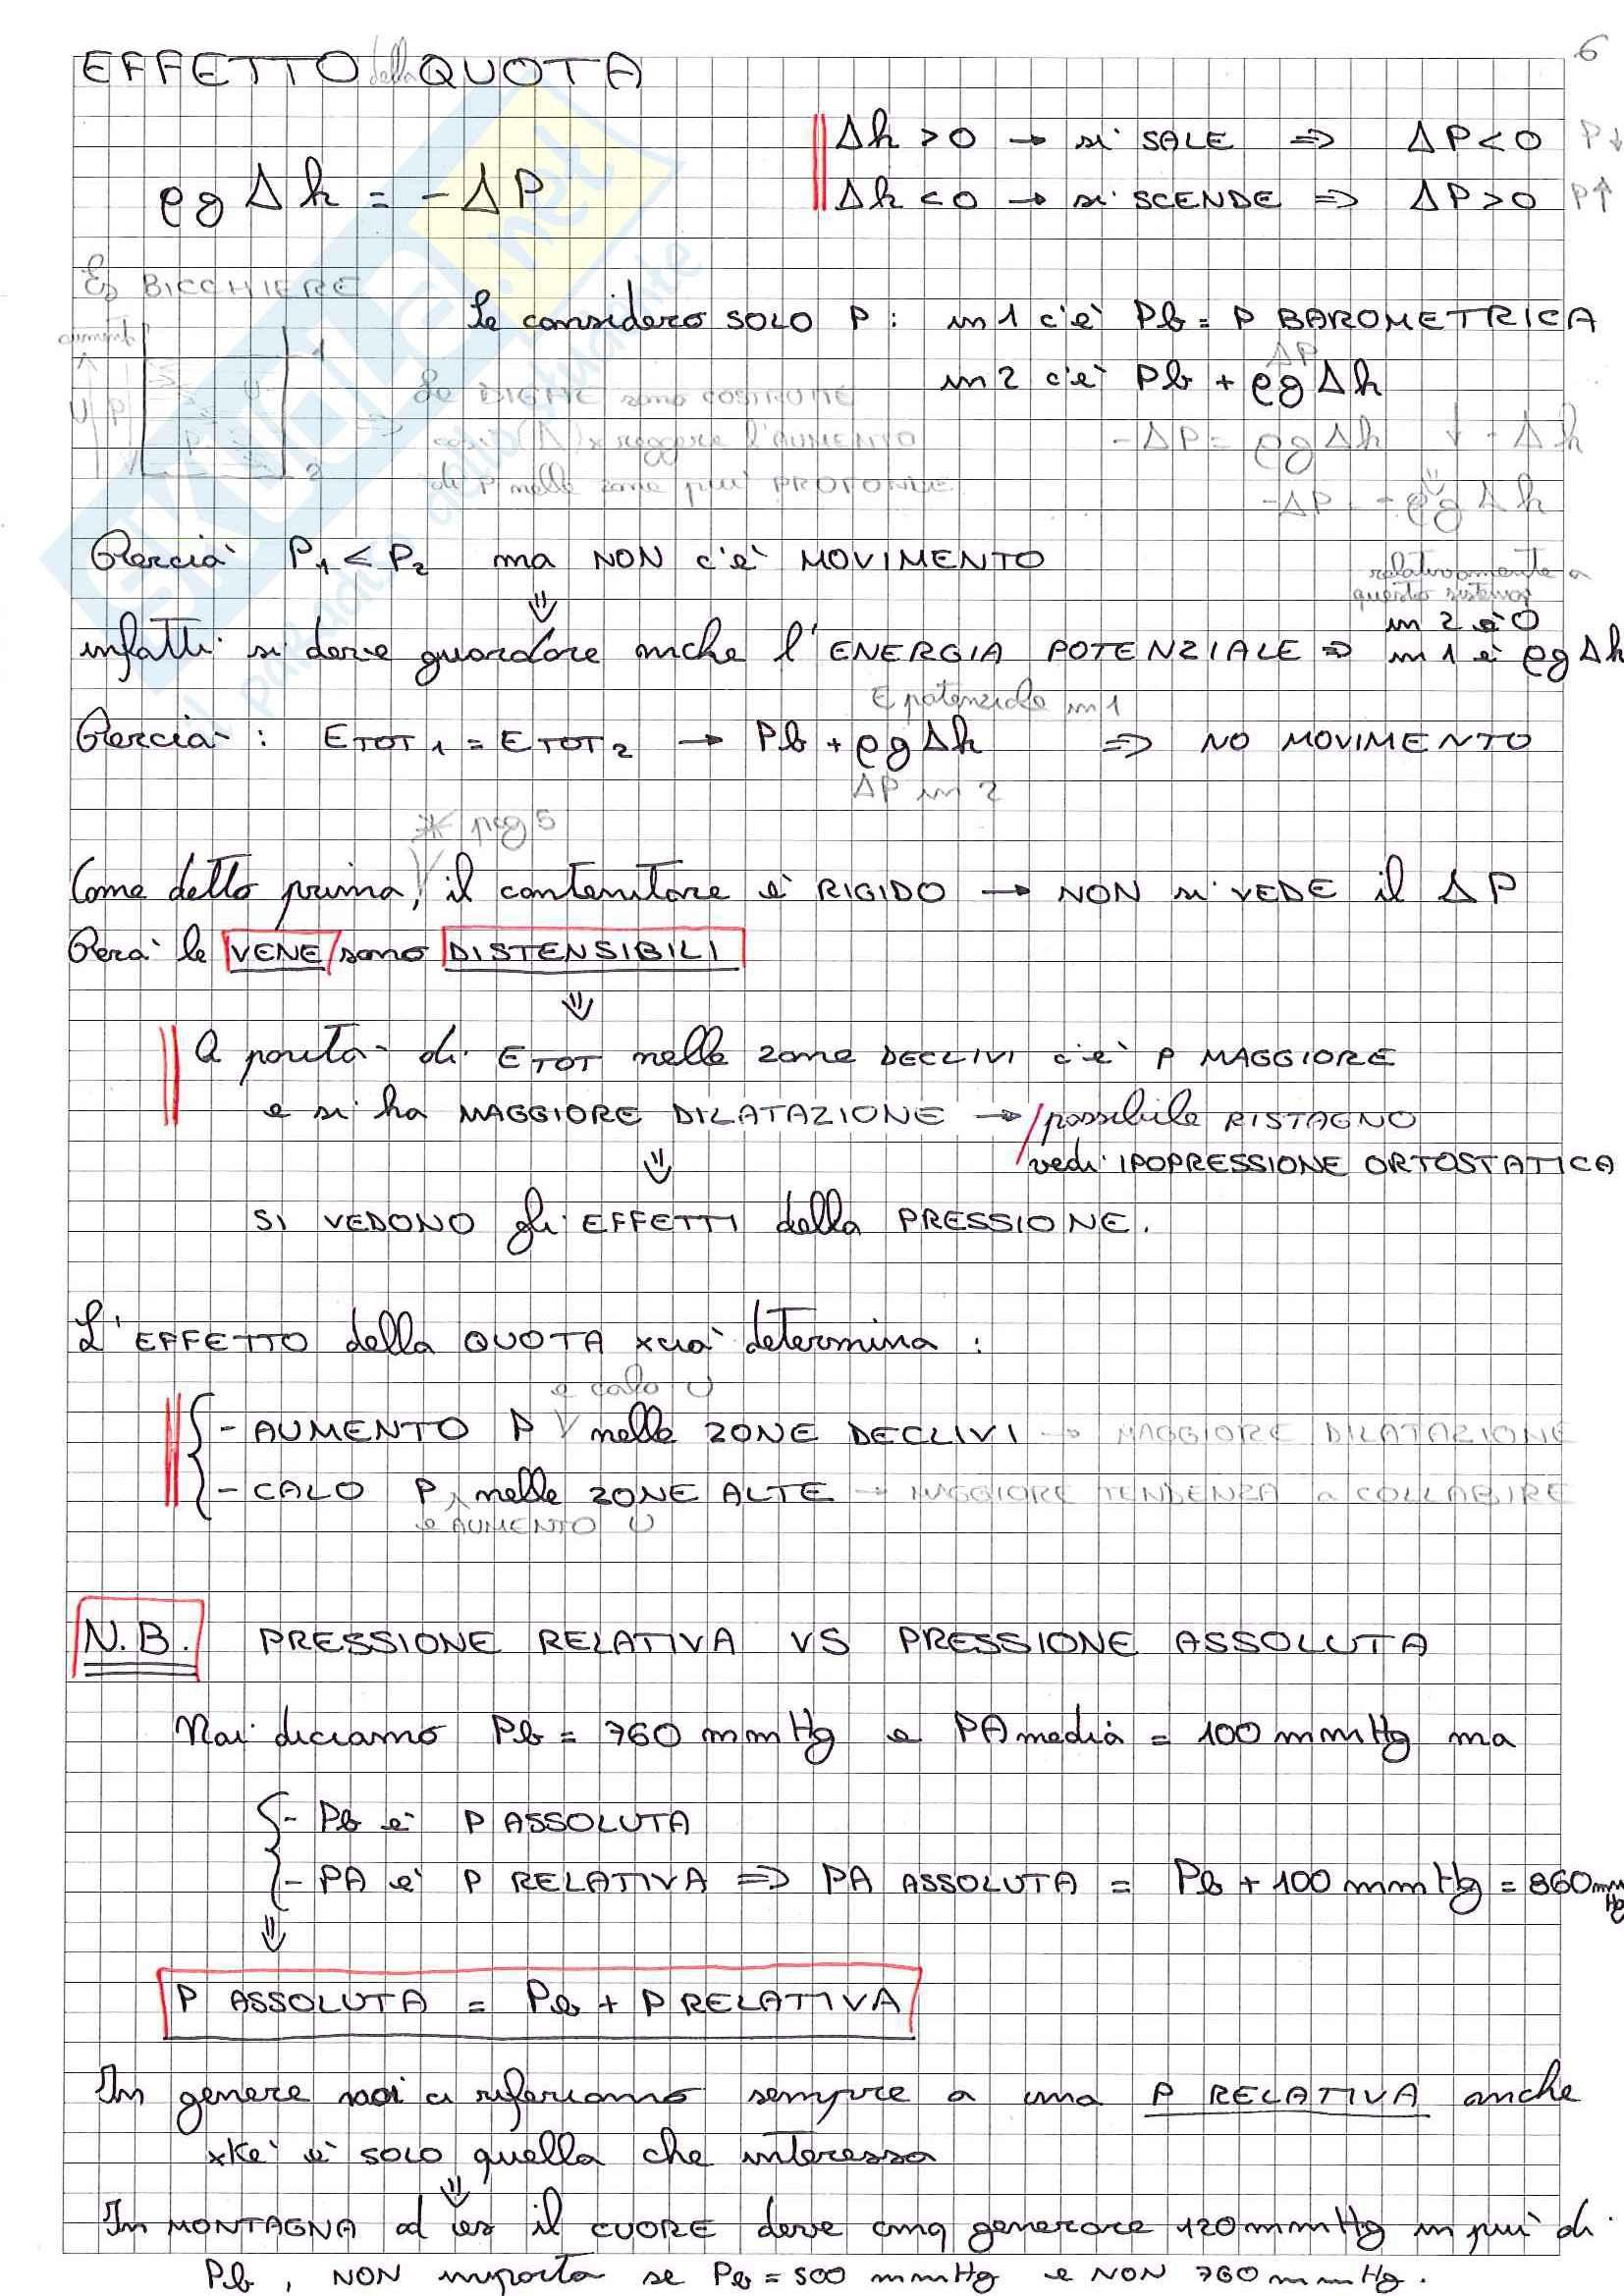 Riassunto esame Fisiologia, prof Minetti, libro consigliato Fisiologia Umana, Baldissera (parte 1) Pag. 11